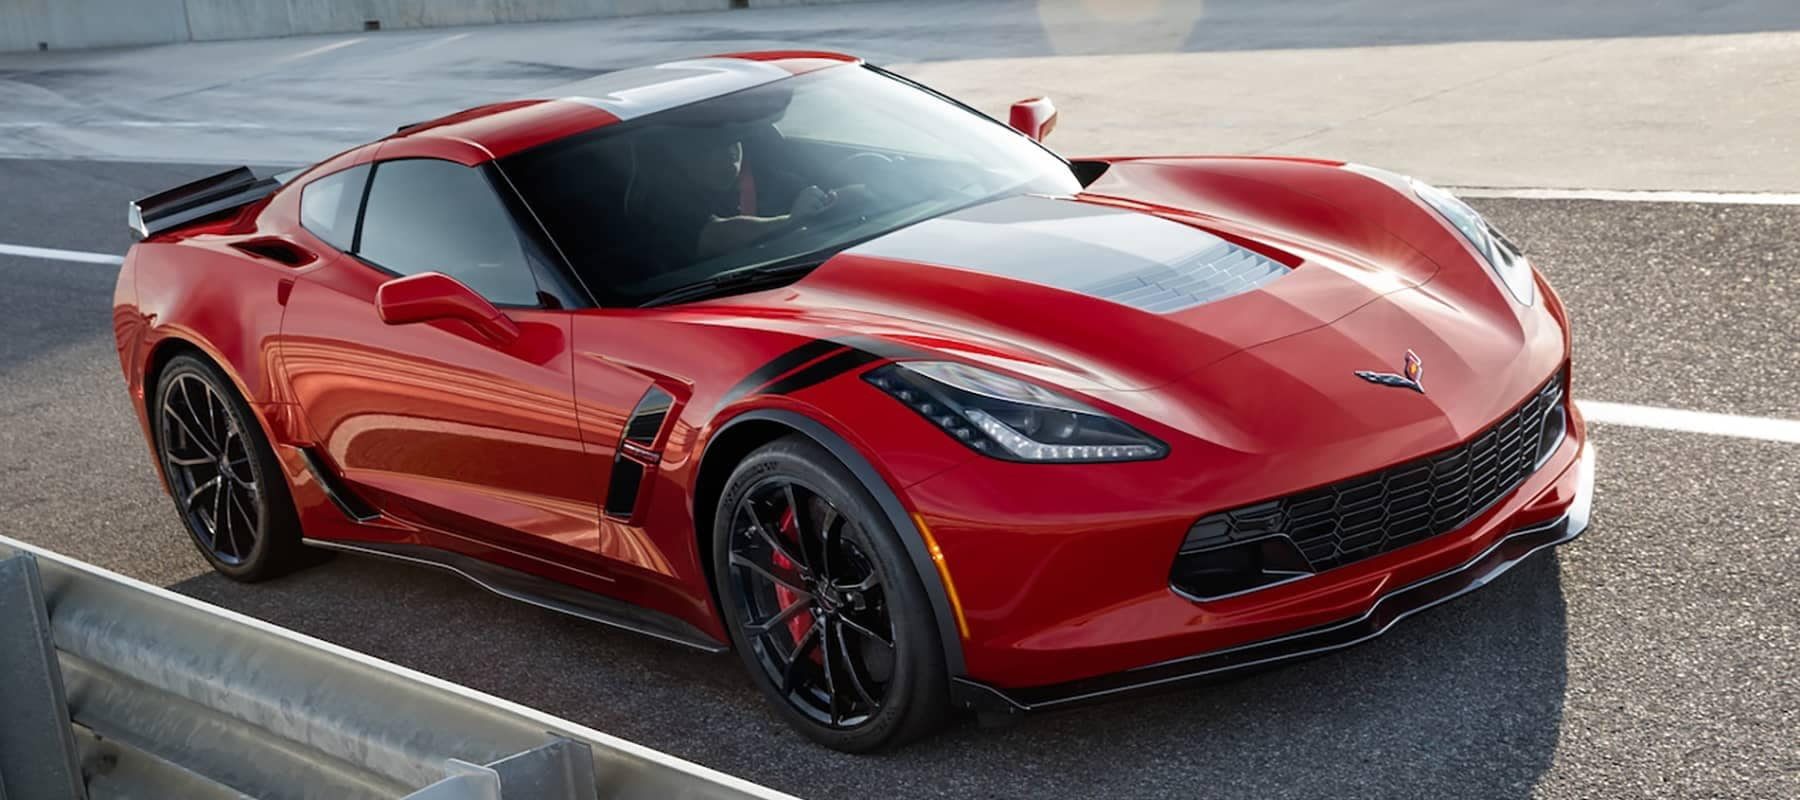 2019 Chevy Corvette Grand Sport On the Track